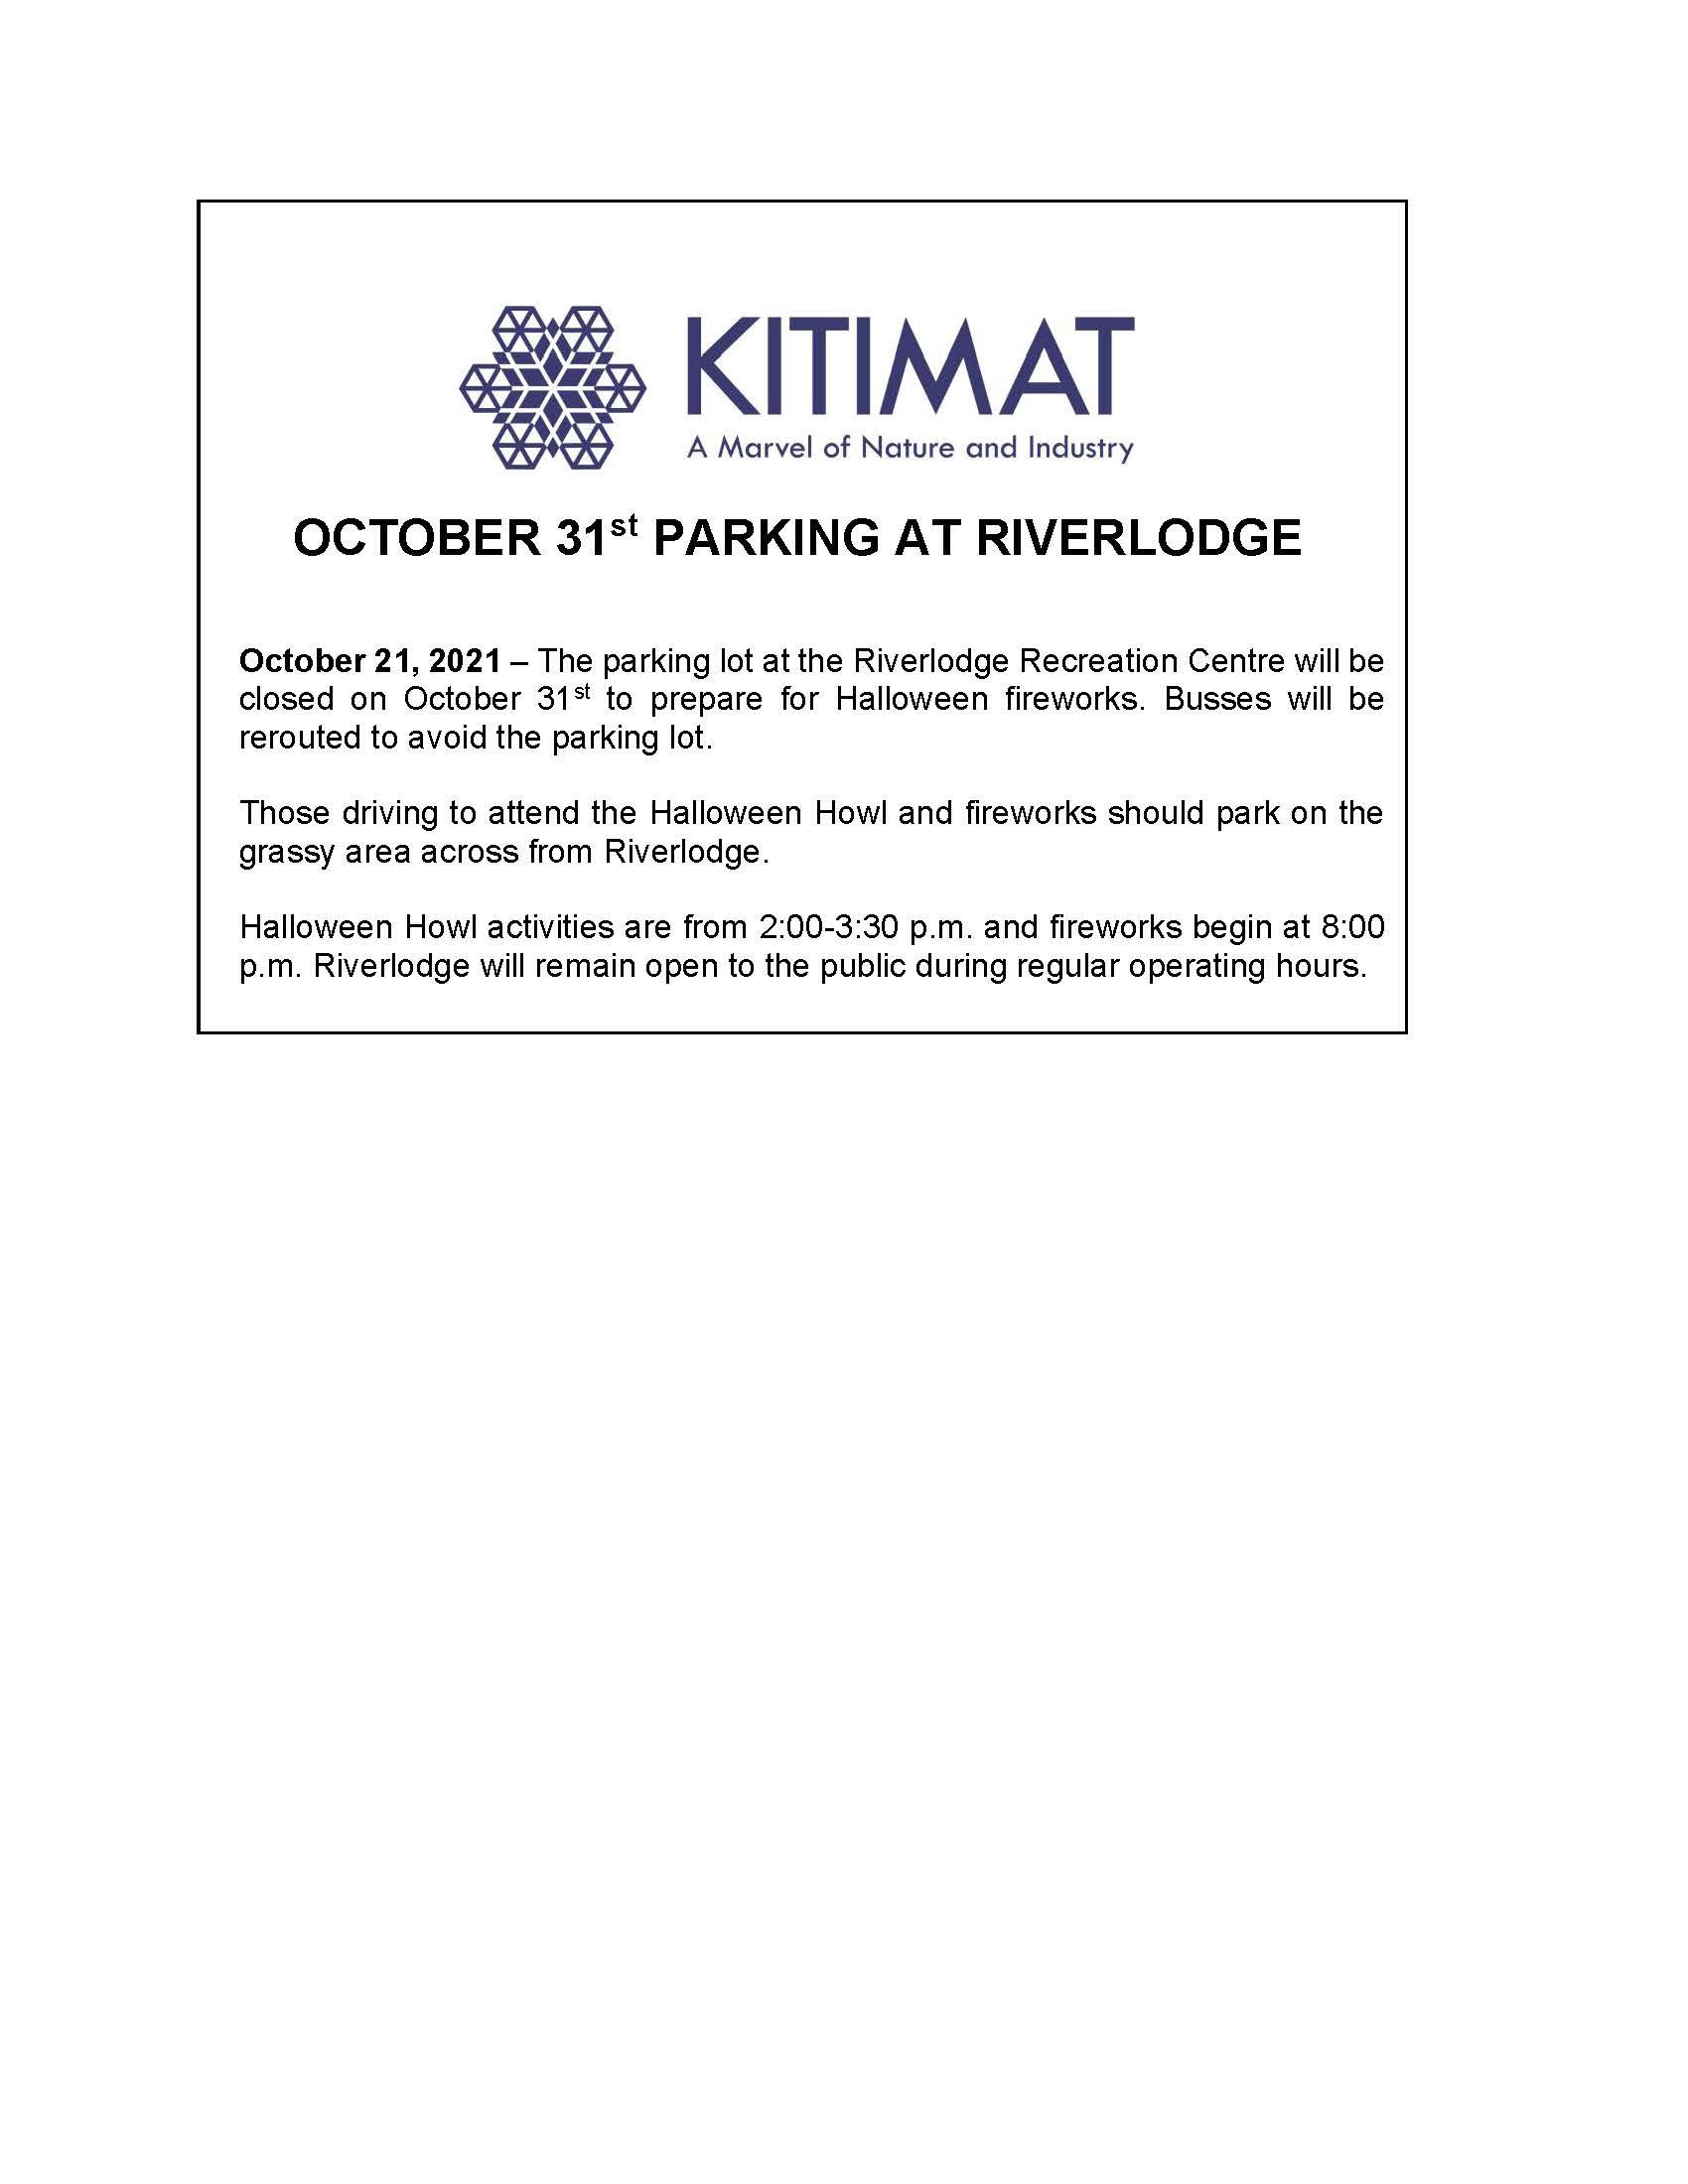 OCTOBER 31st NO PARKING AT RIVERLODGE